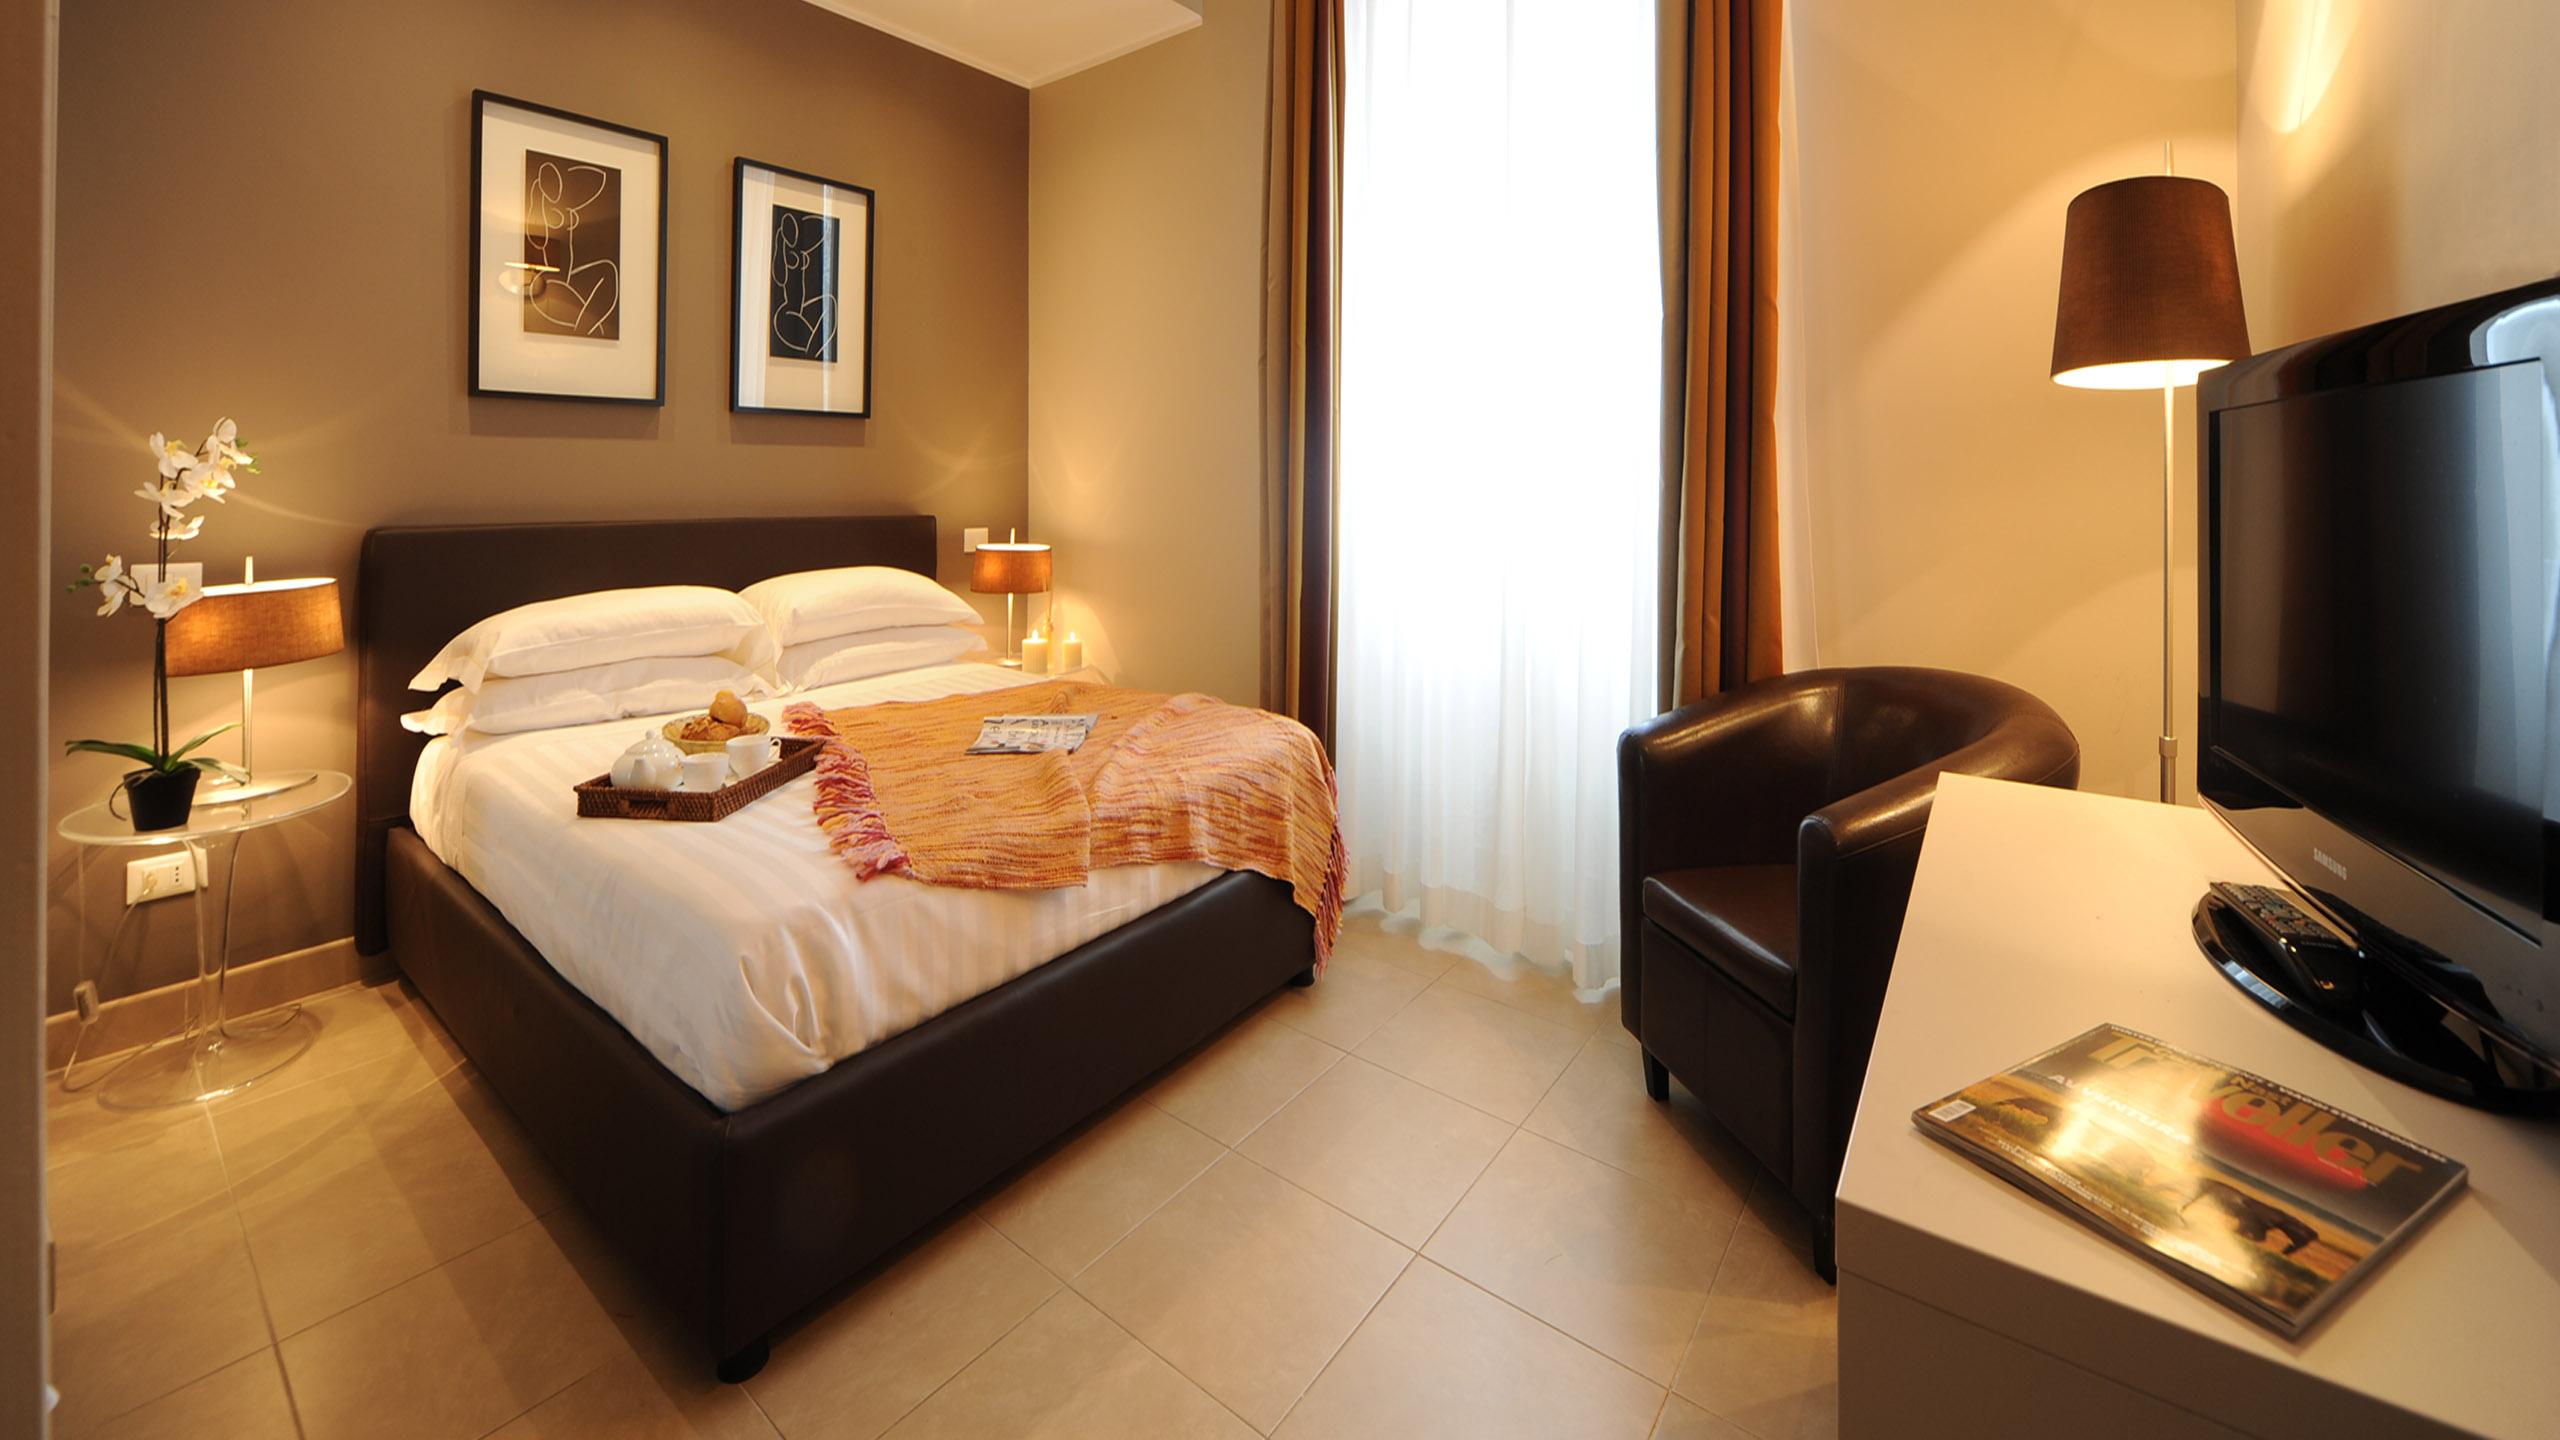 Residence-Trianon-Borgo-Pio-Roma-Appartamento-Grande-2020-Letto-2.jpg